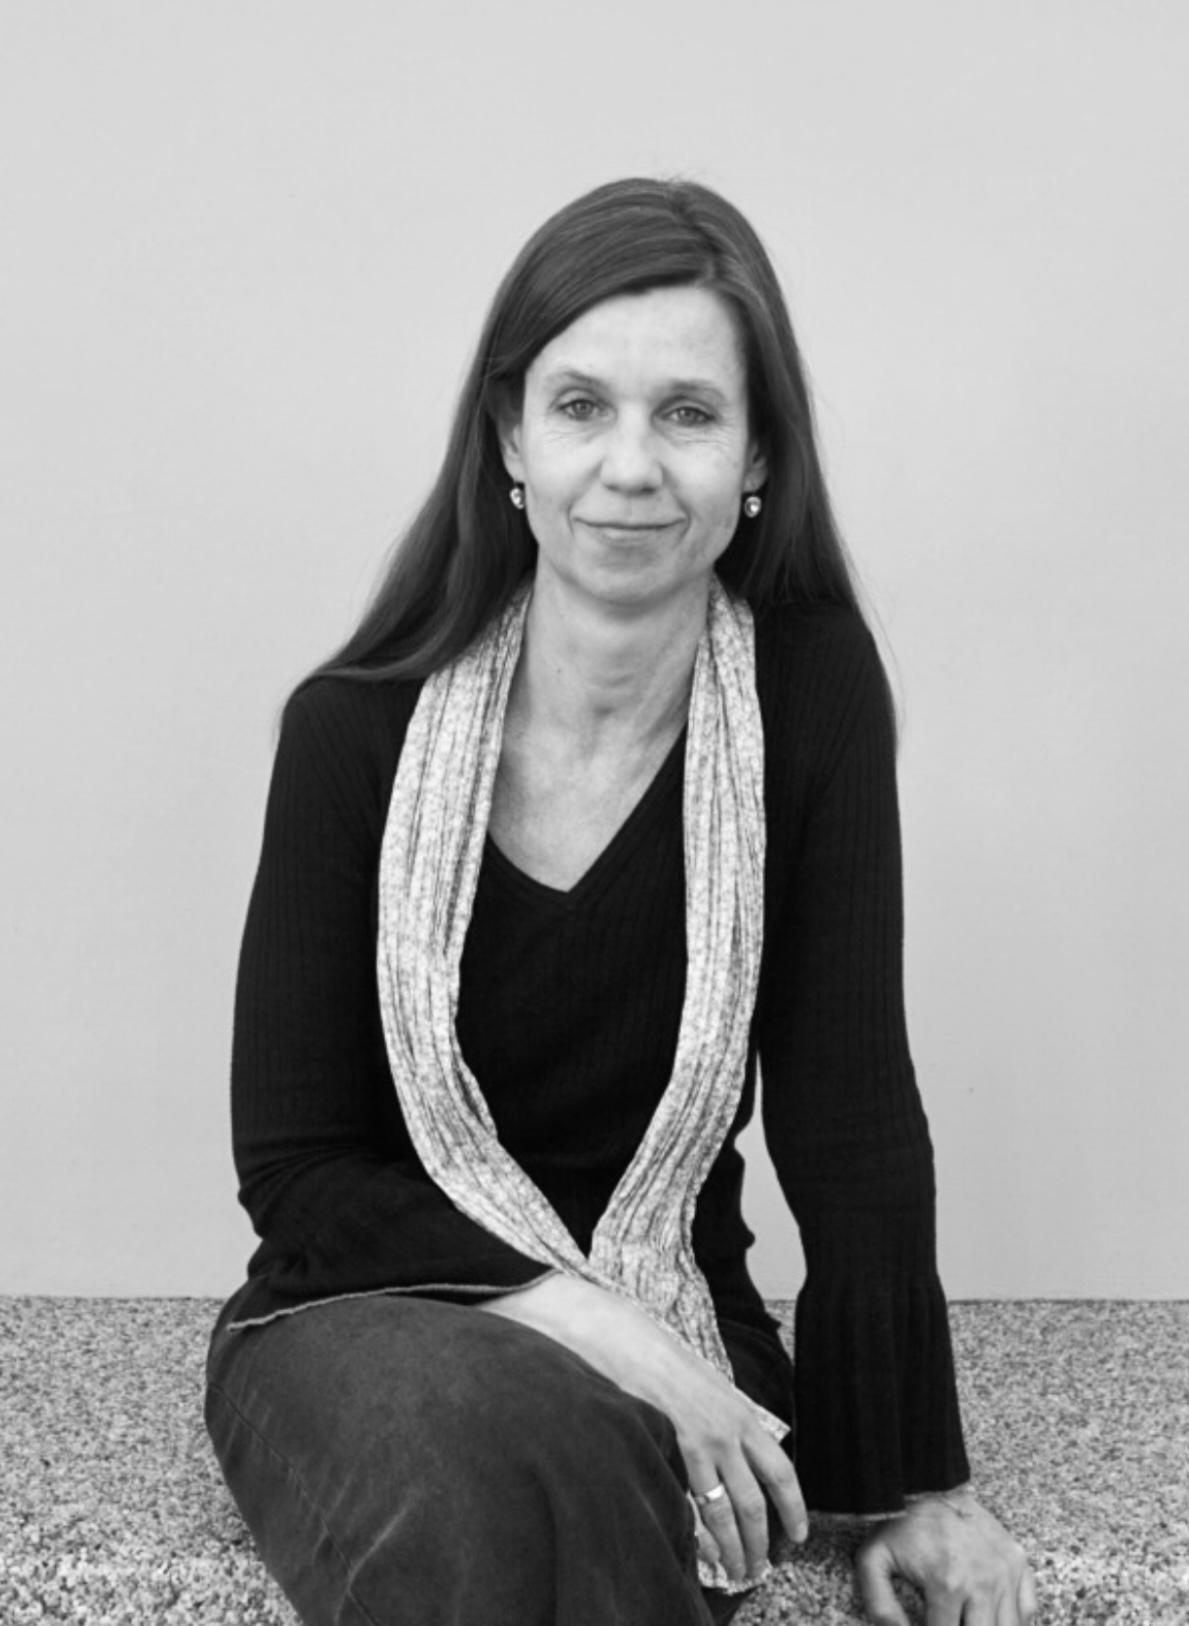 Gita Krowatschek